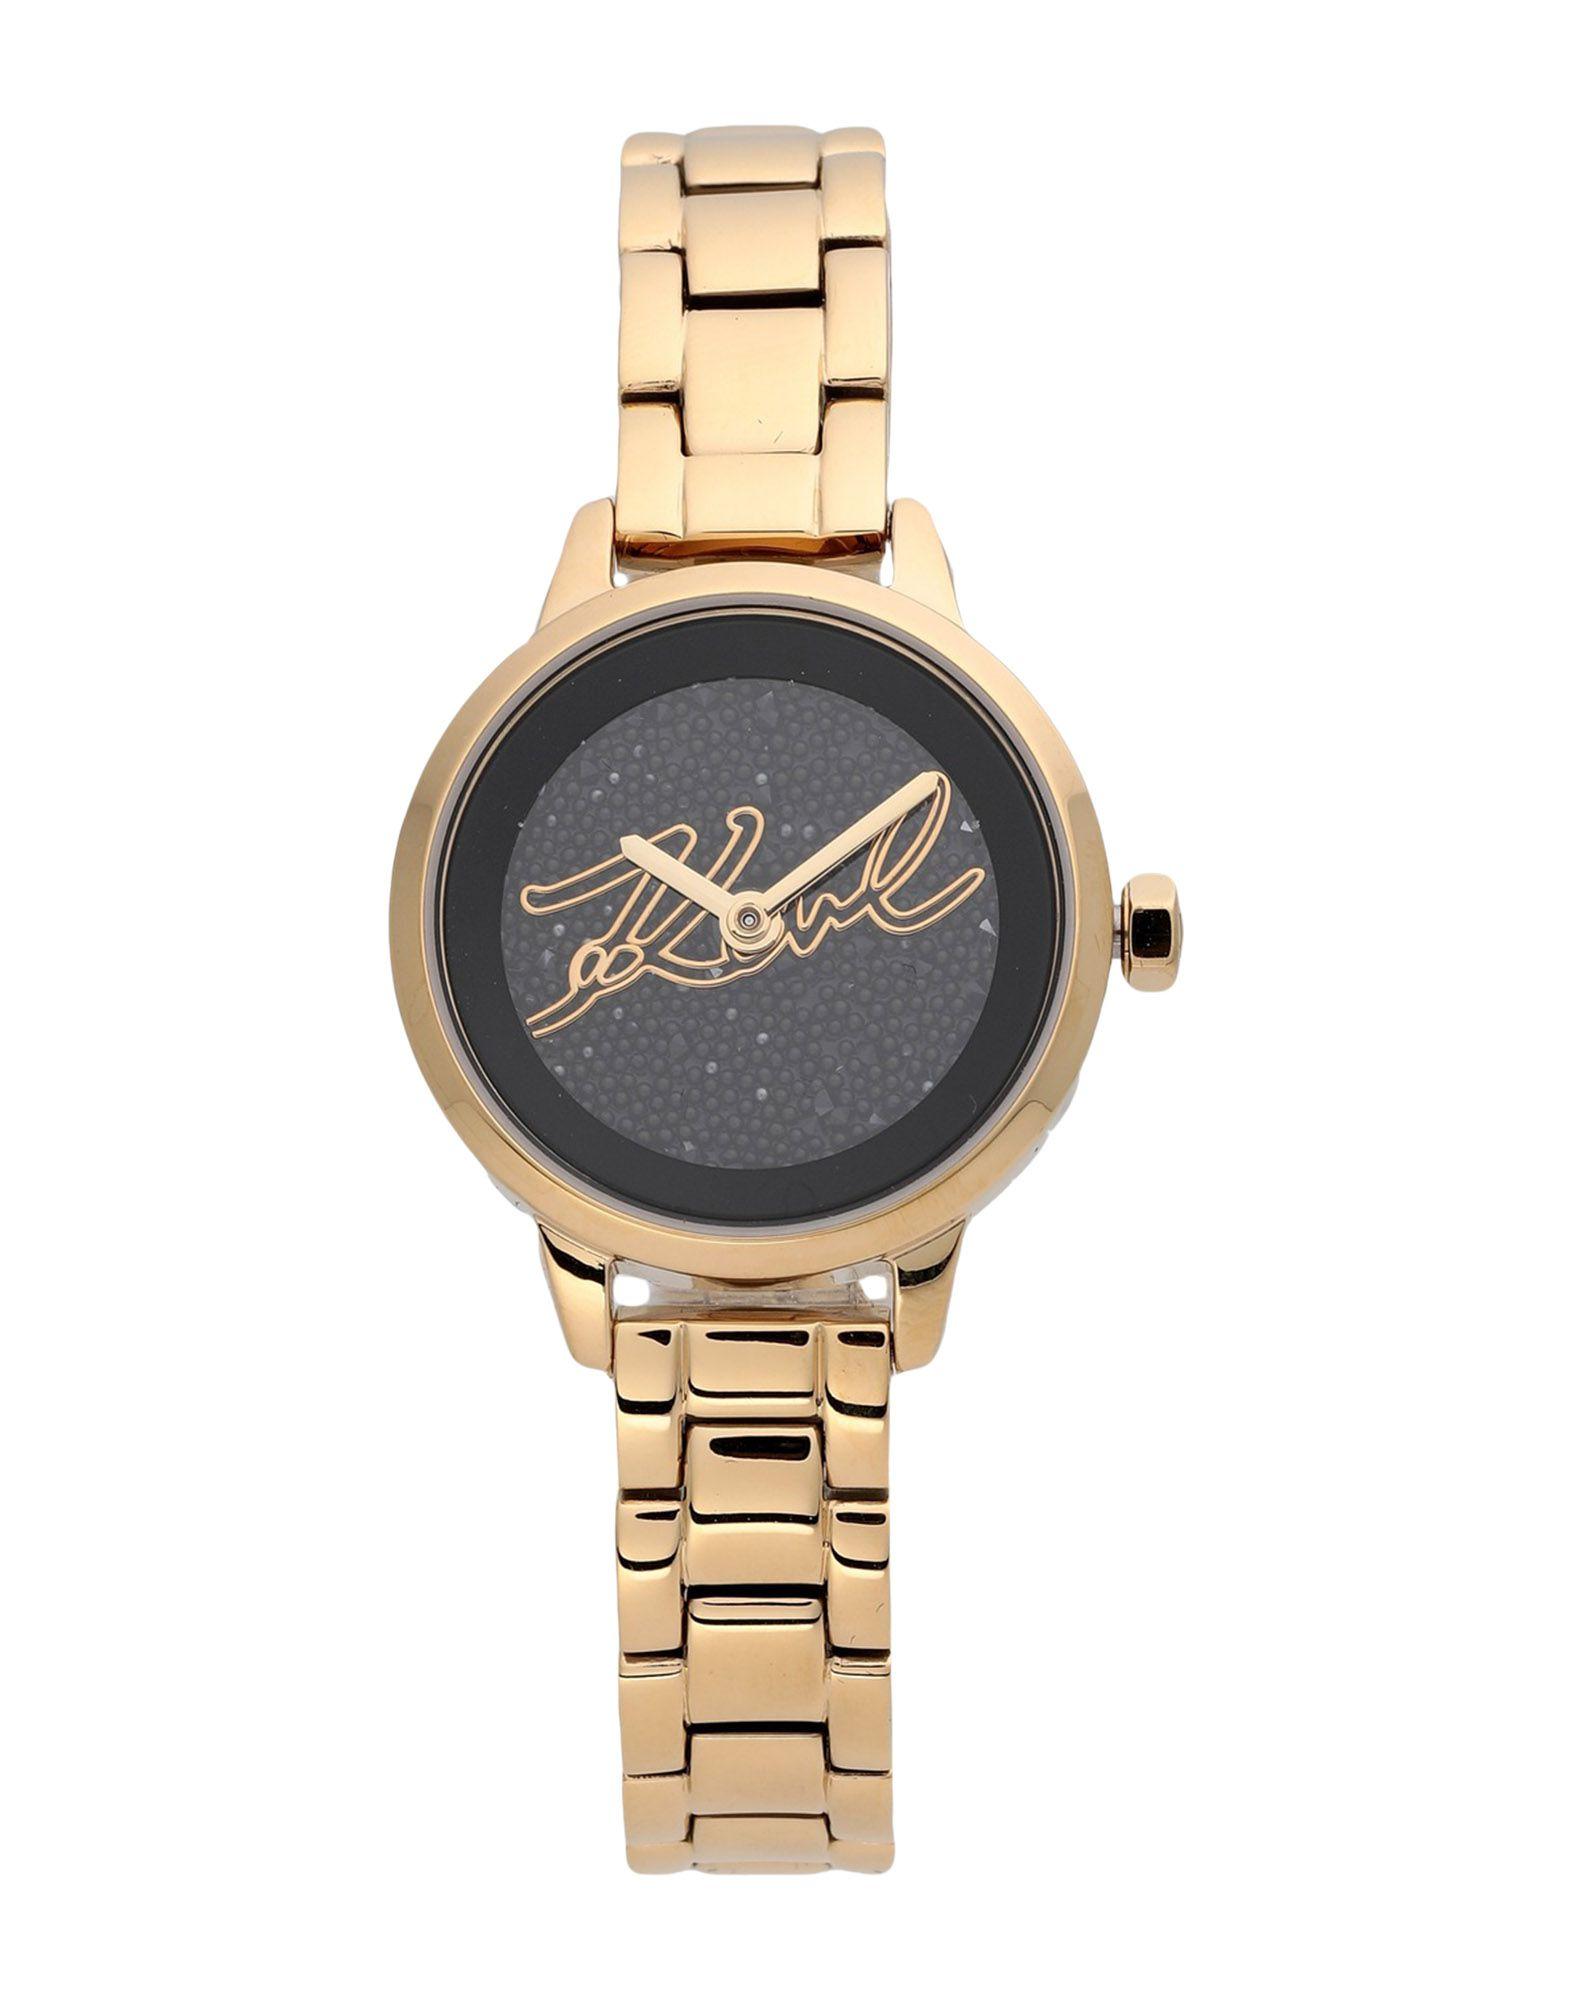 KARL LAGERFELD Wrist watches - Item 58050709